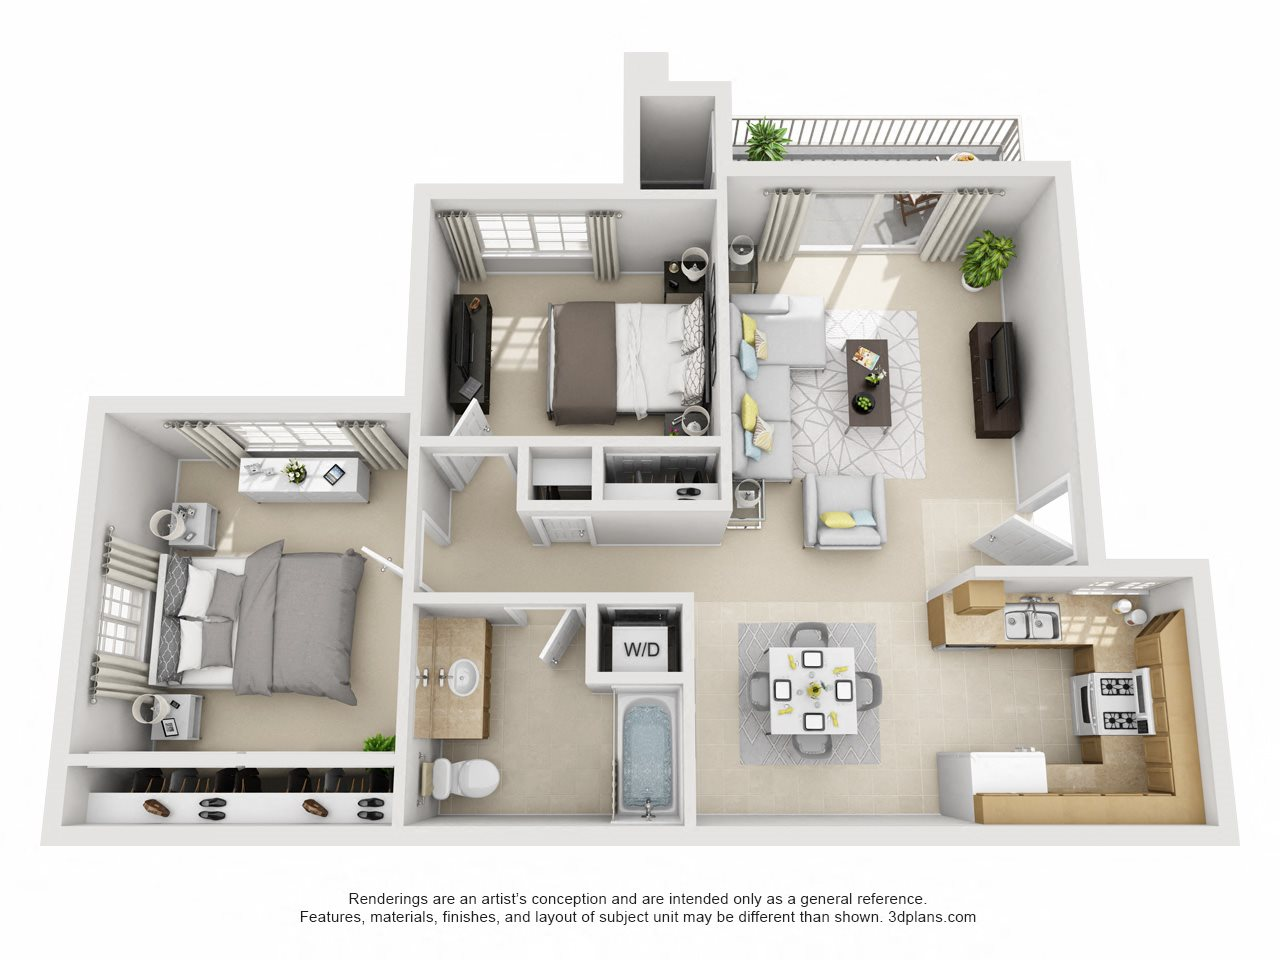 2 Bedroom, 1 Bath Upstairs Floor Plan 4